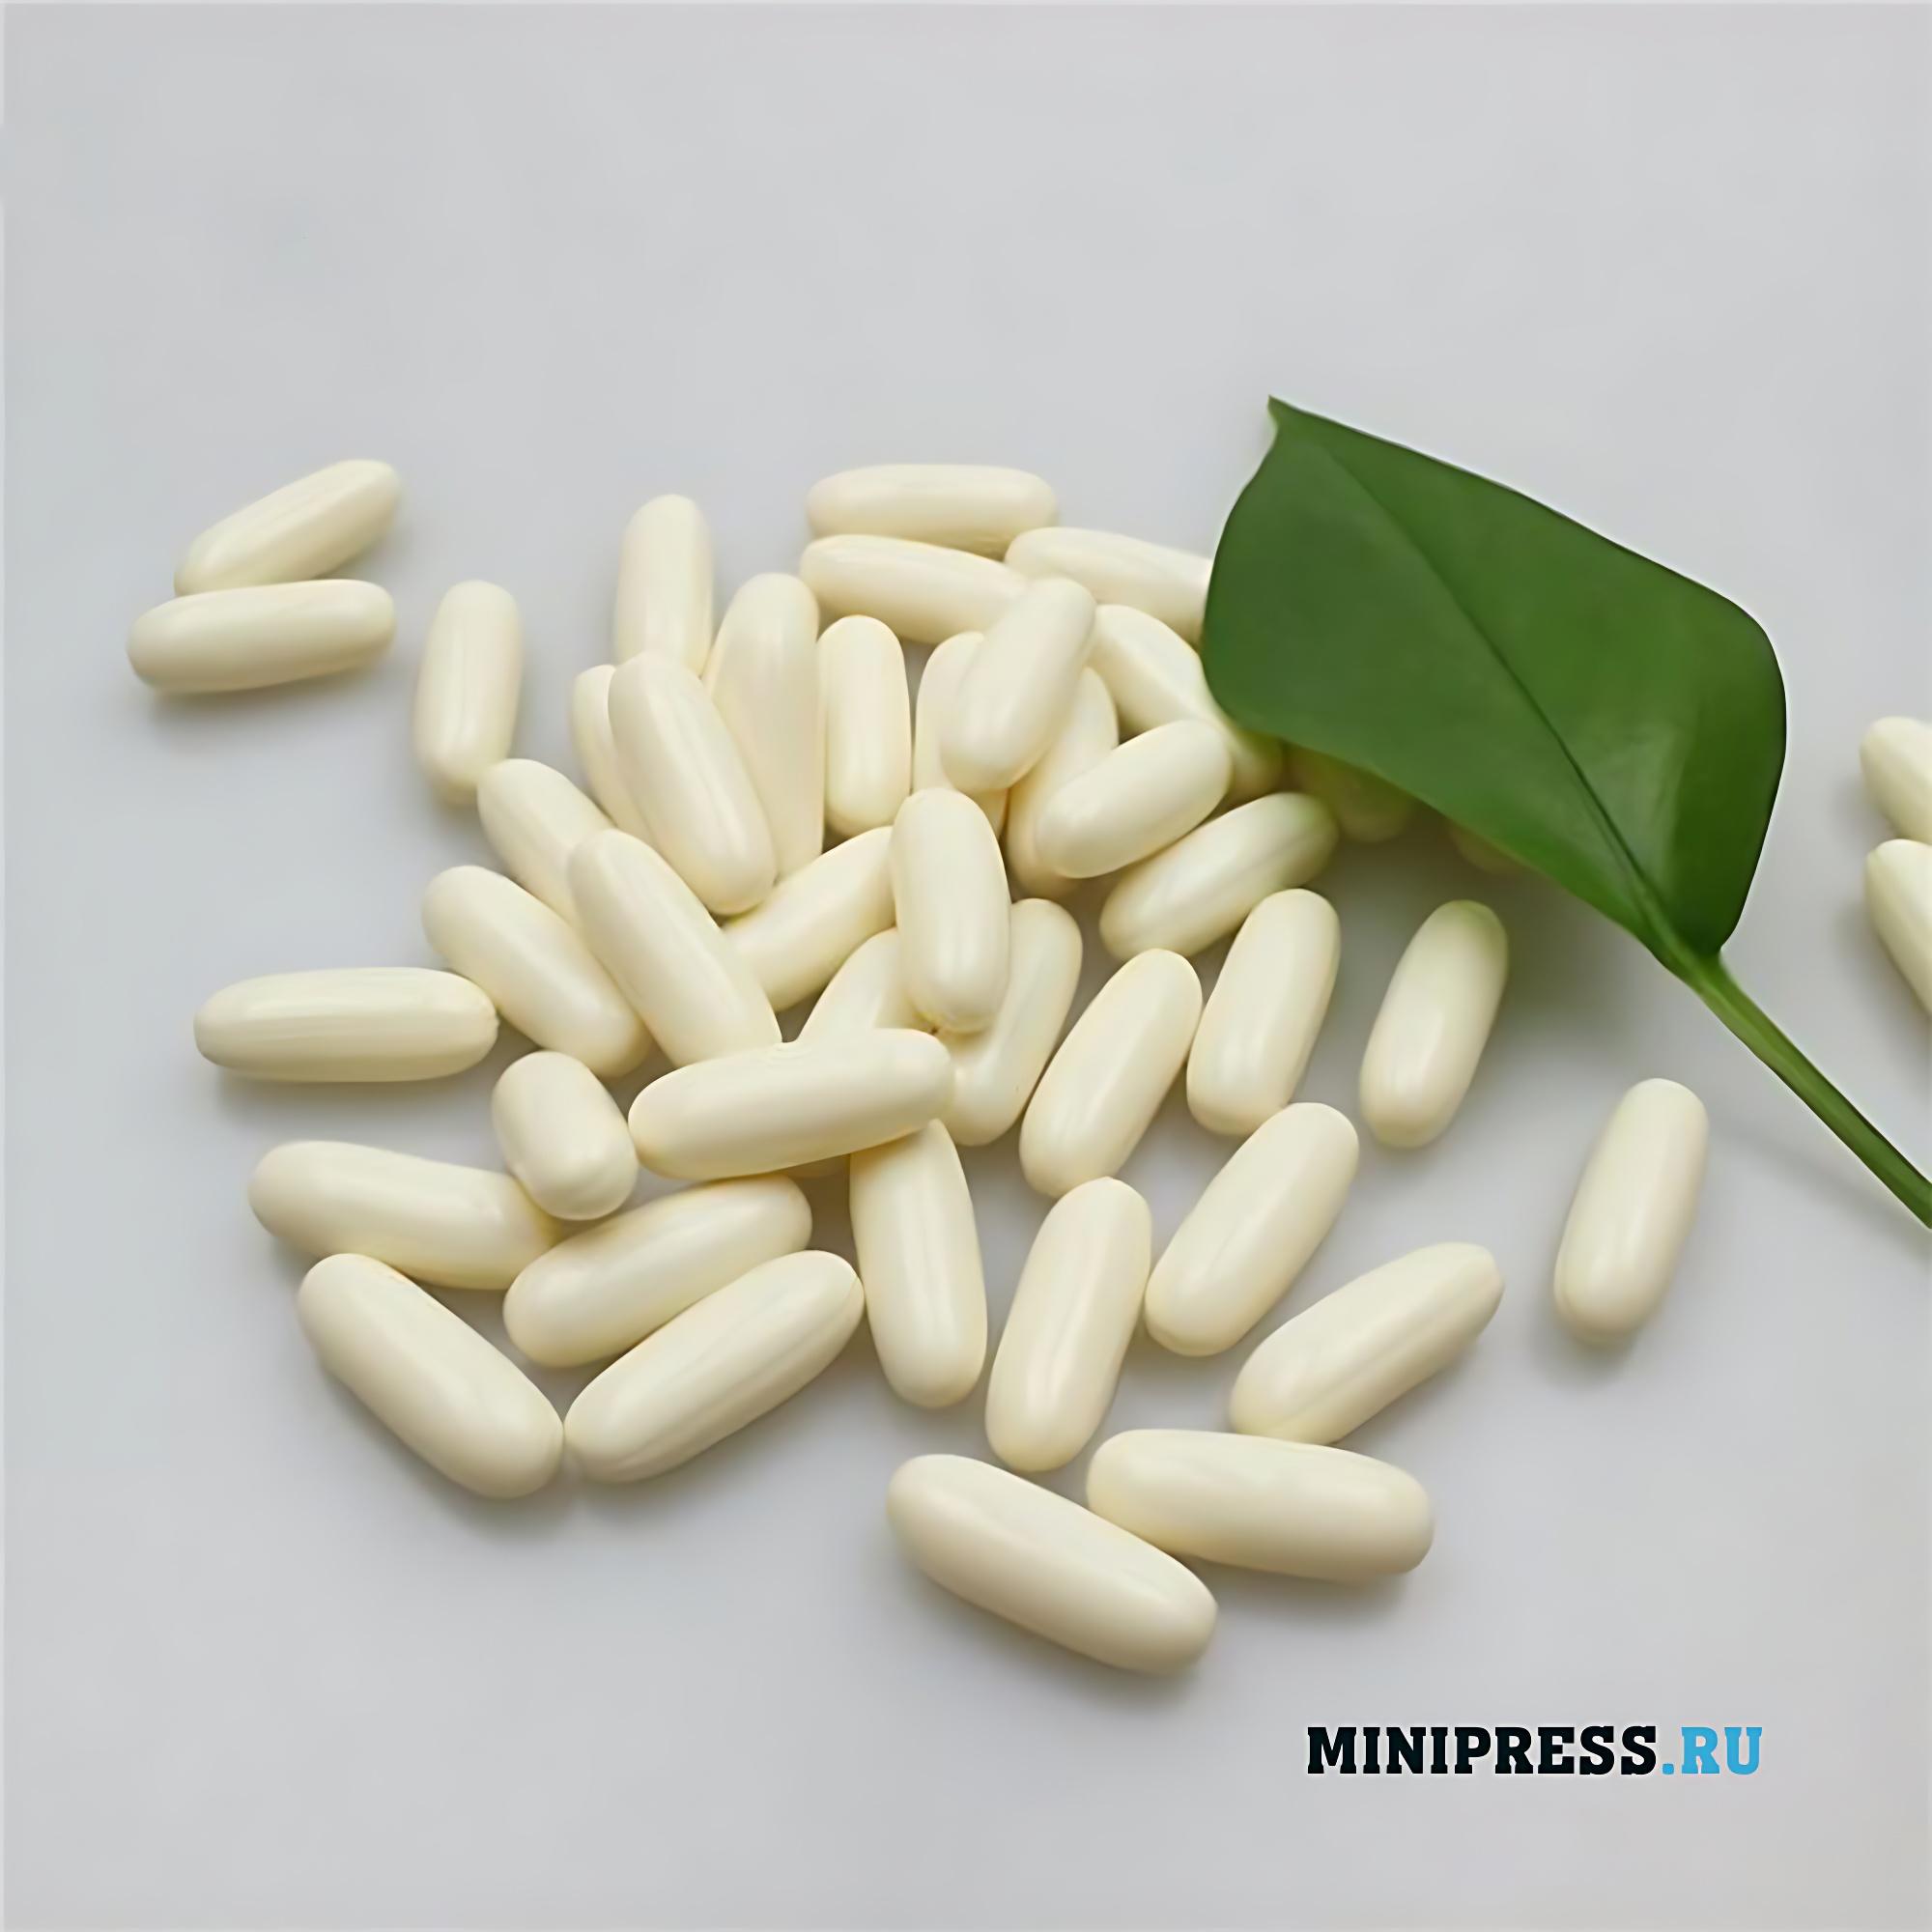 Фармацевтические технологии